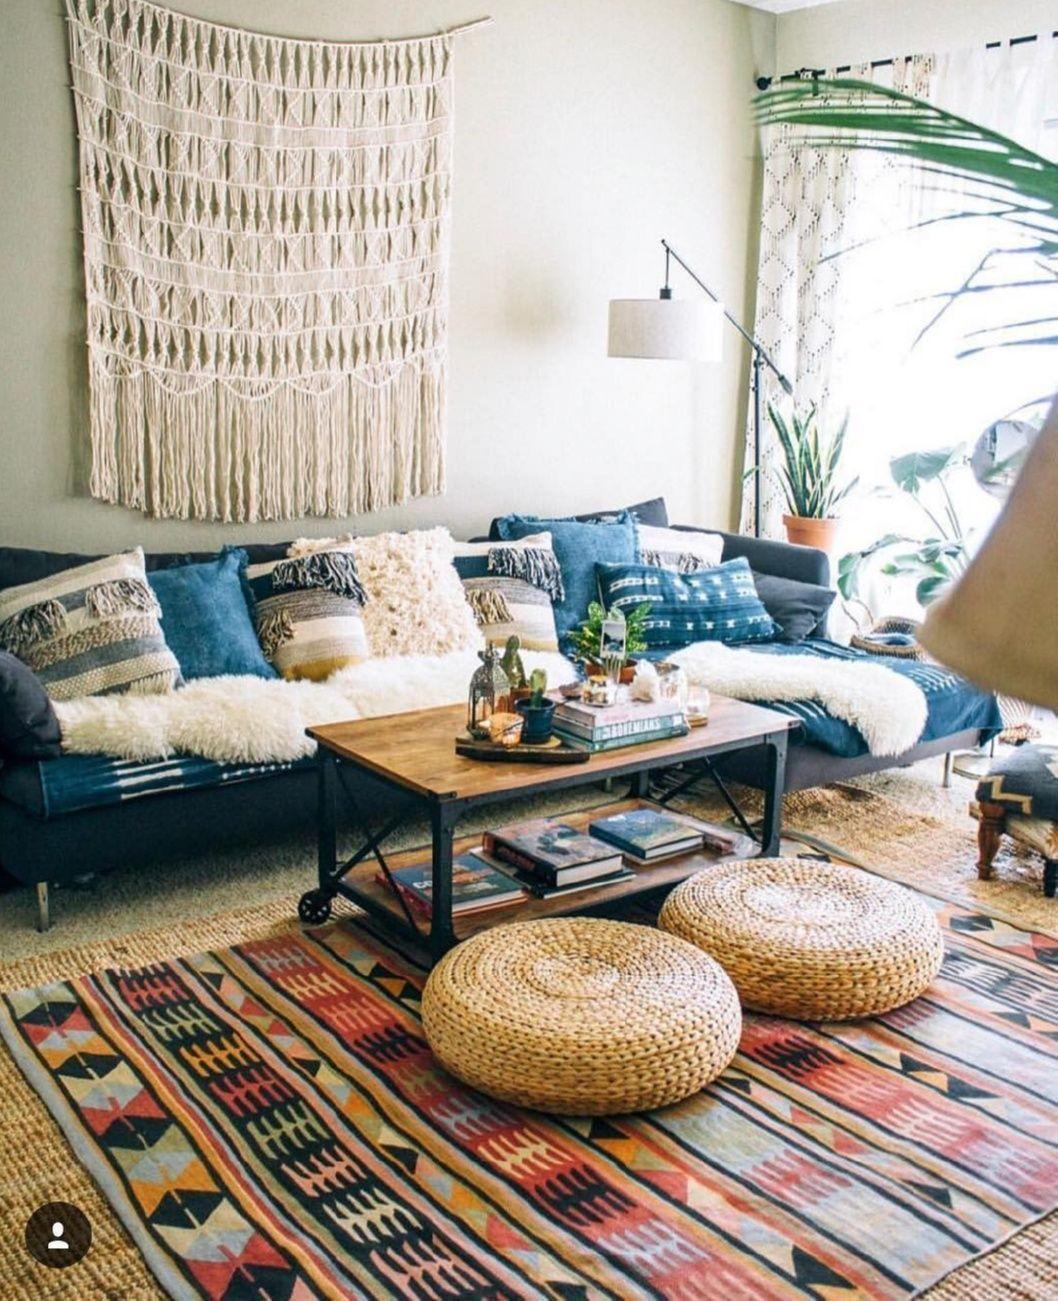 Floor Pillows Living Room Bohemian Interior Design You Must Know Design Rustic Scandinavian Din Minimalist Living Room Hippie Interior Living Room Designs